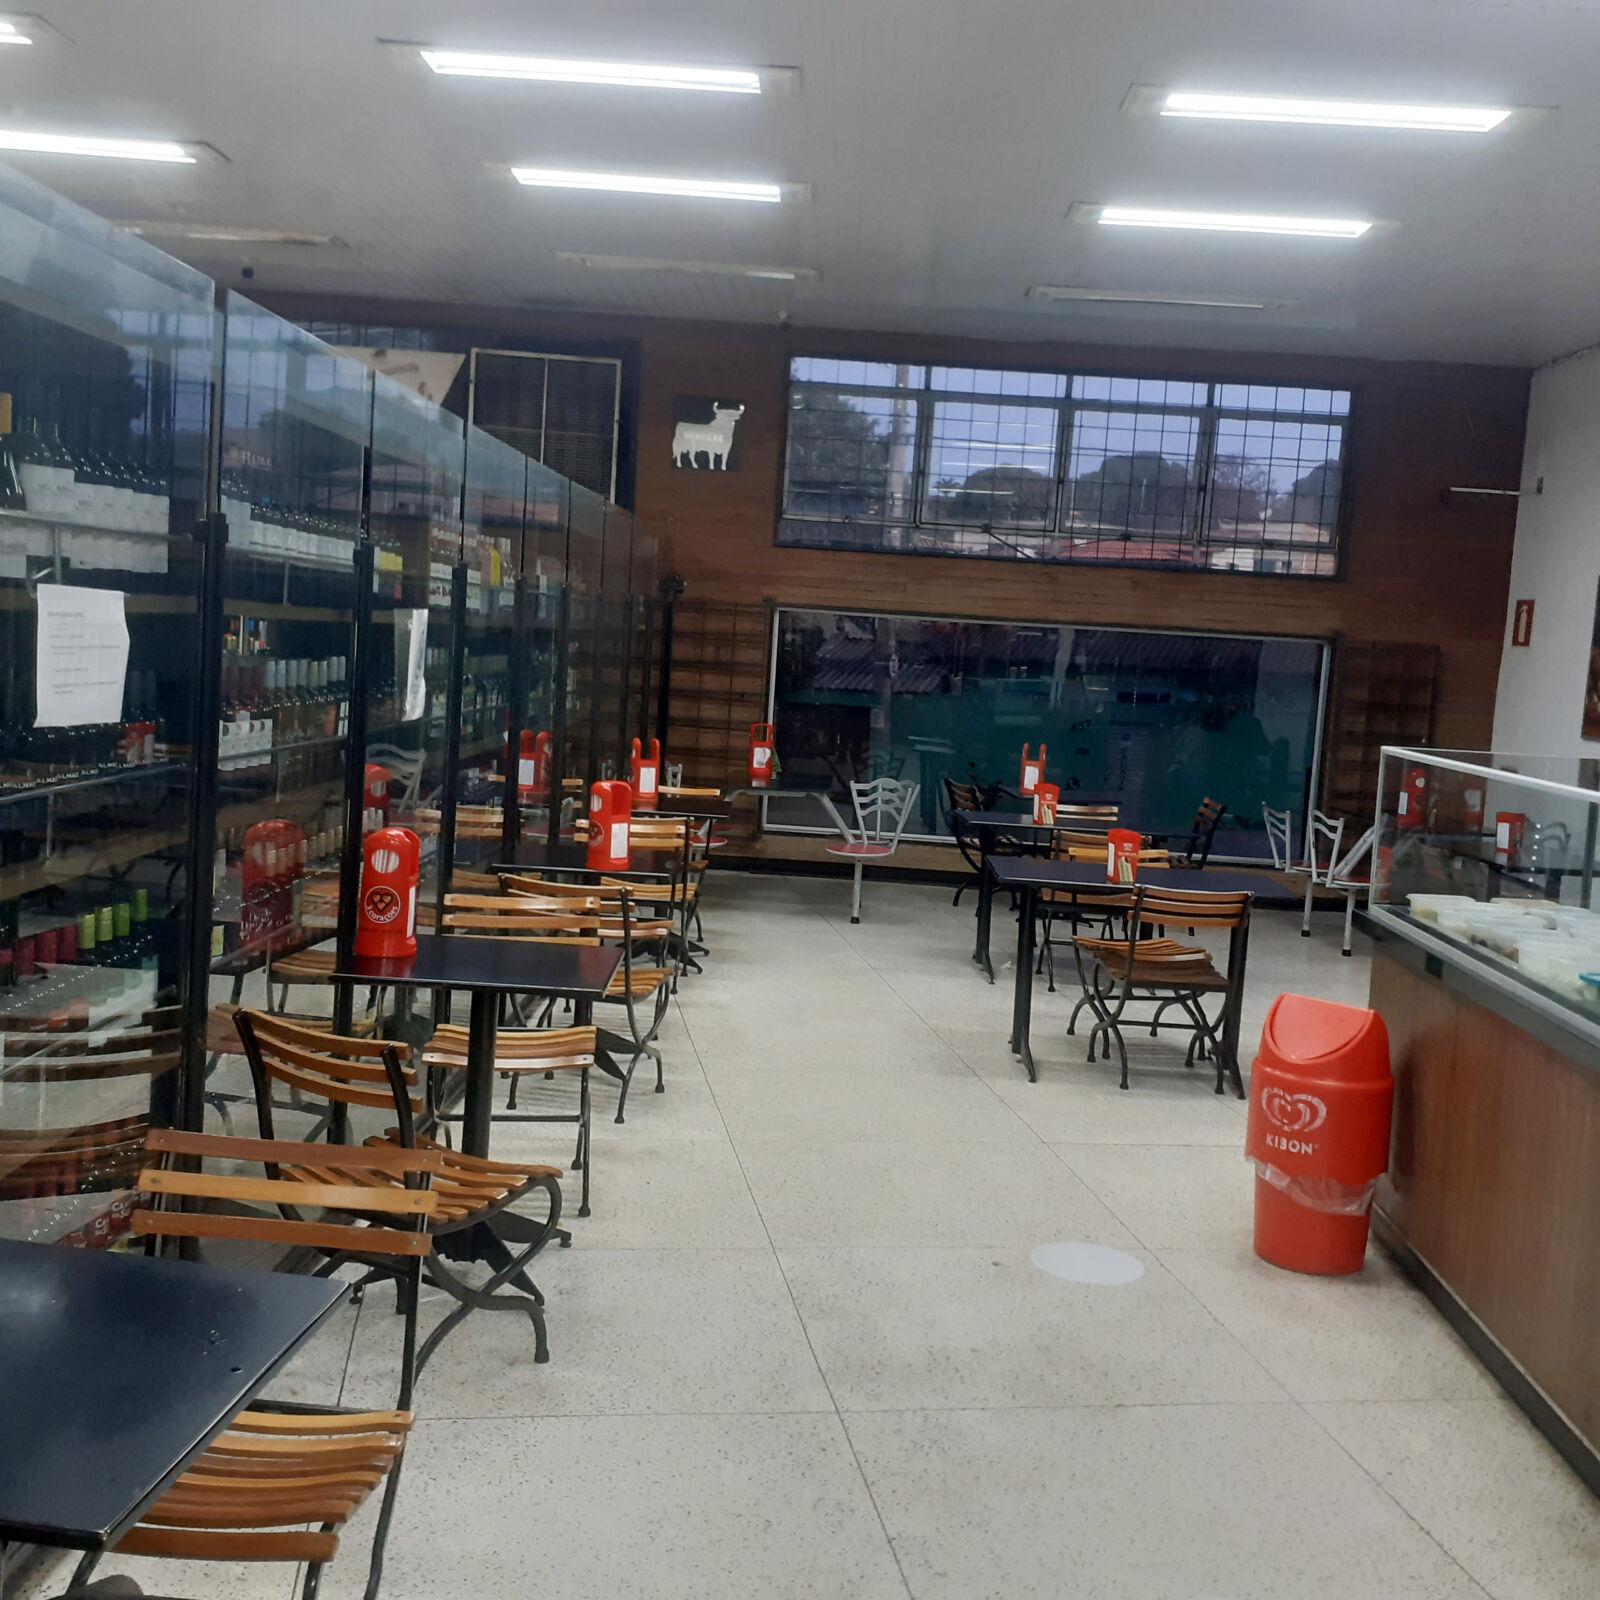 Bairro Santos Dumont se destaca pela variedade gastronômica